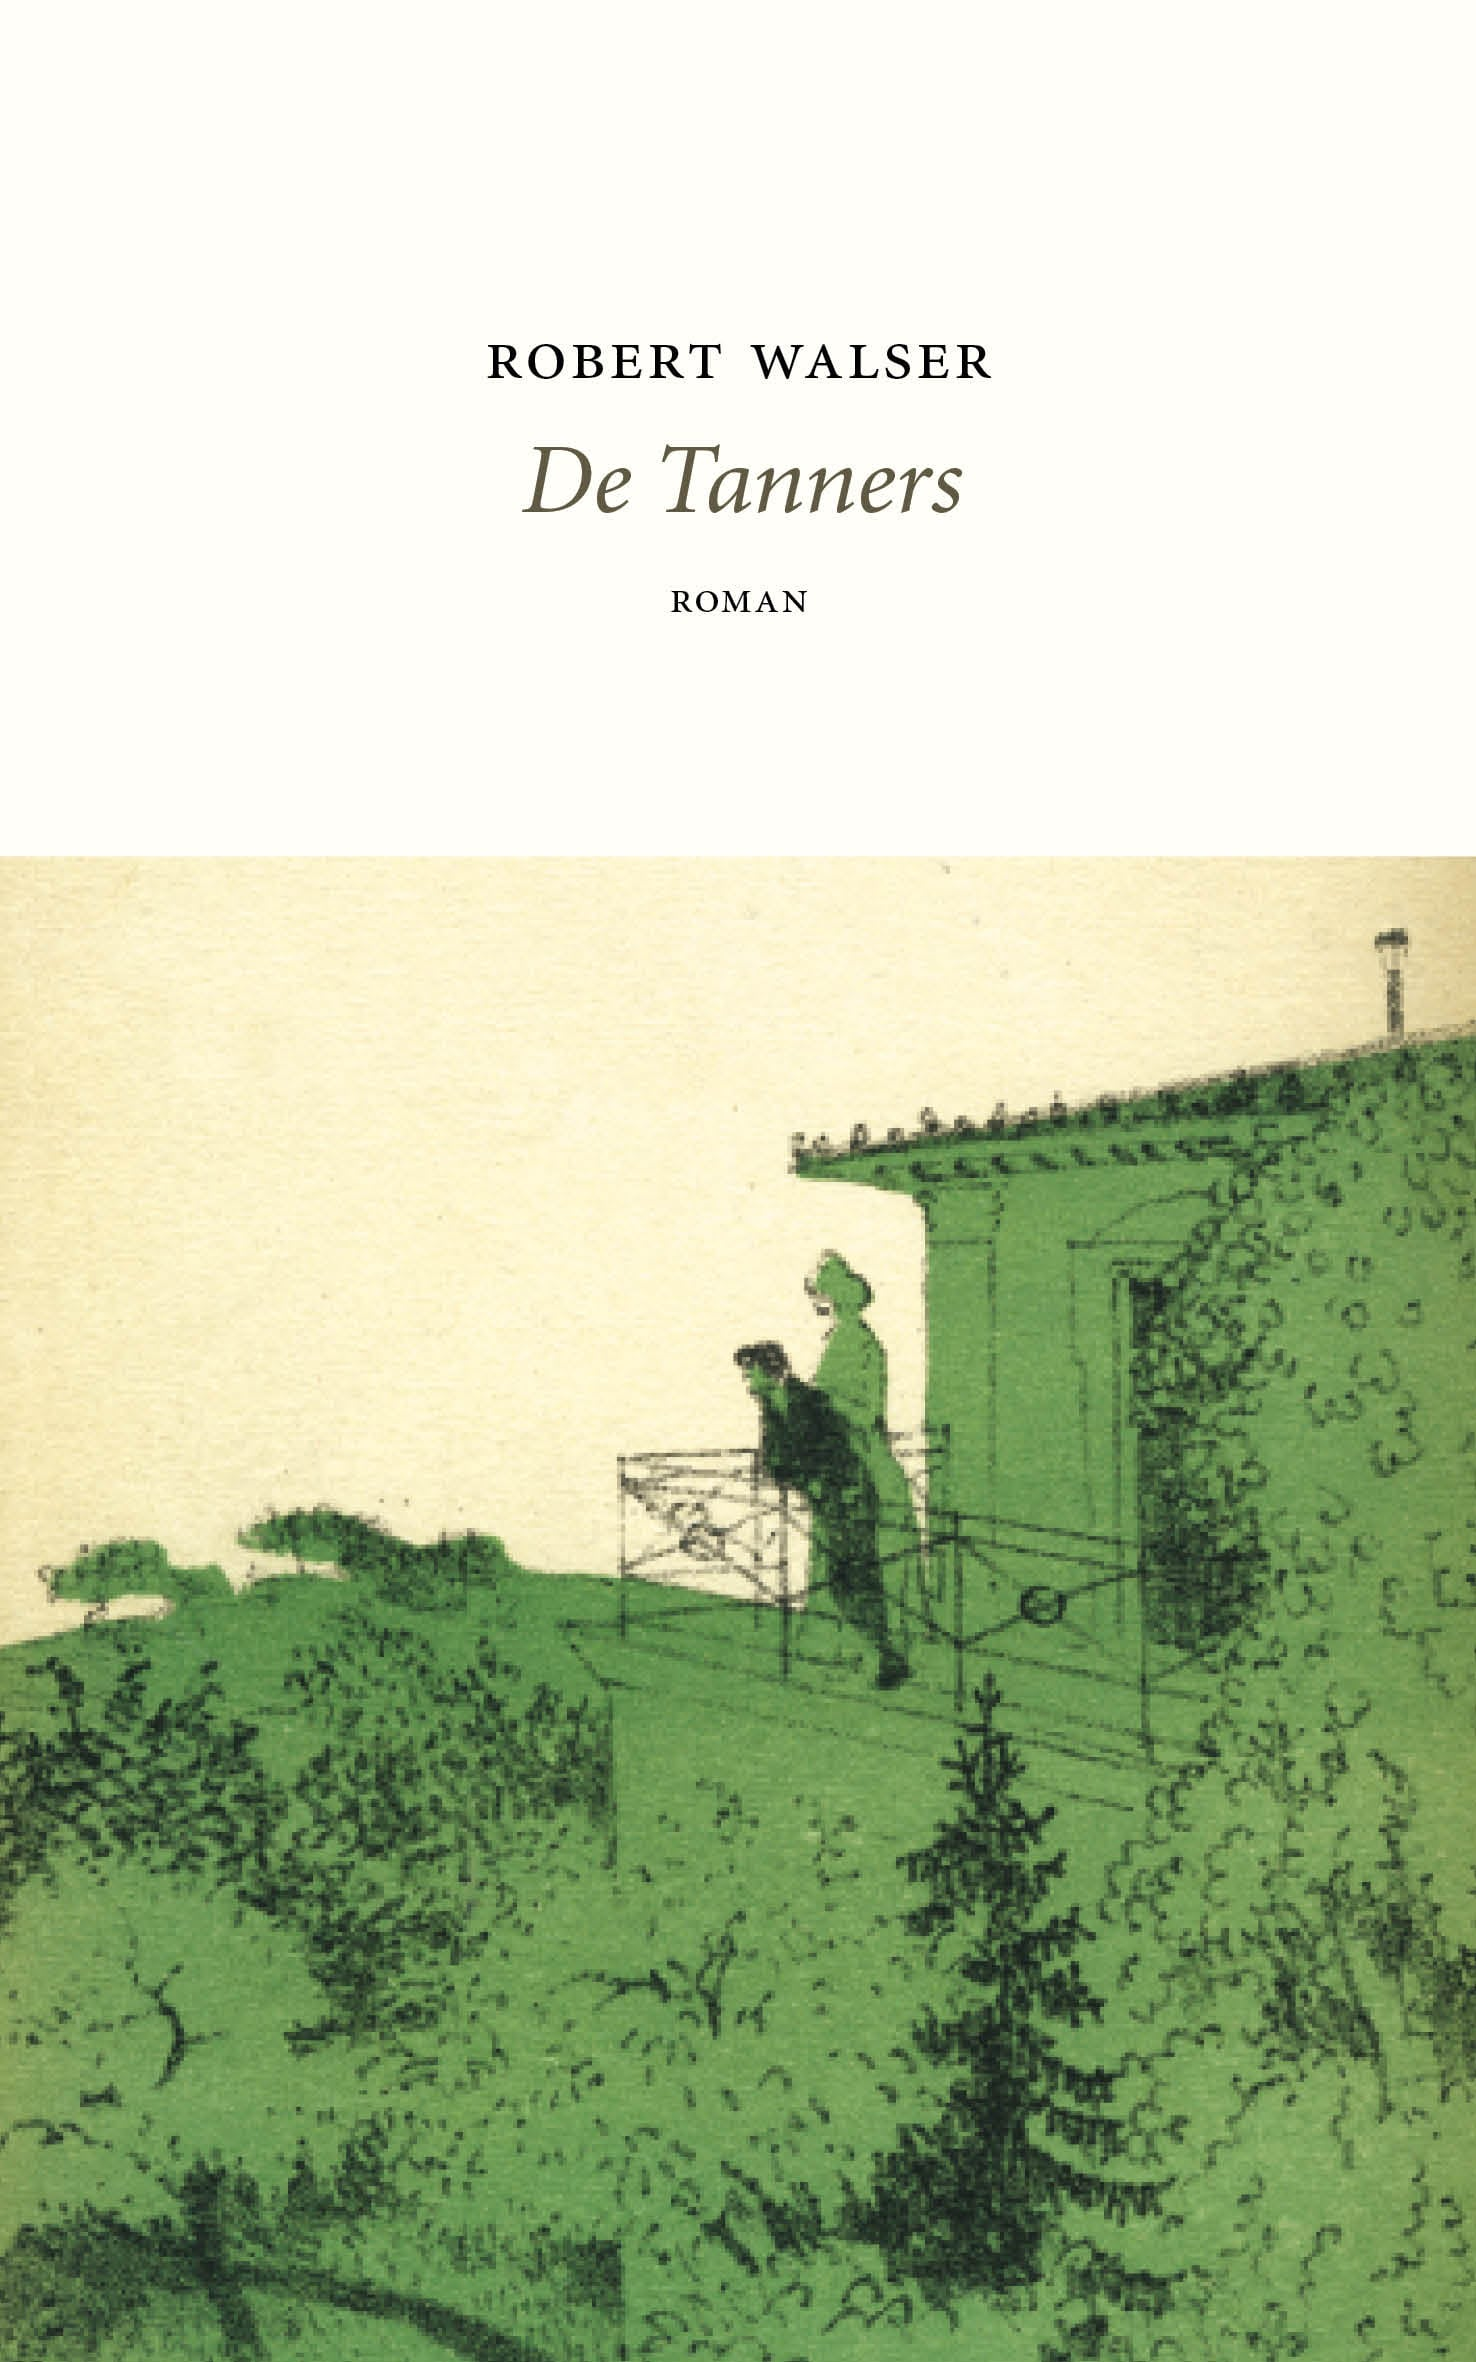 De Tanners – Robert Walser